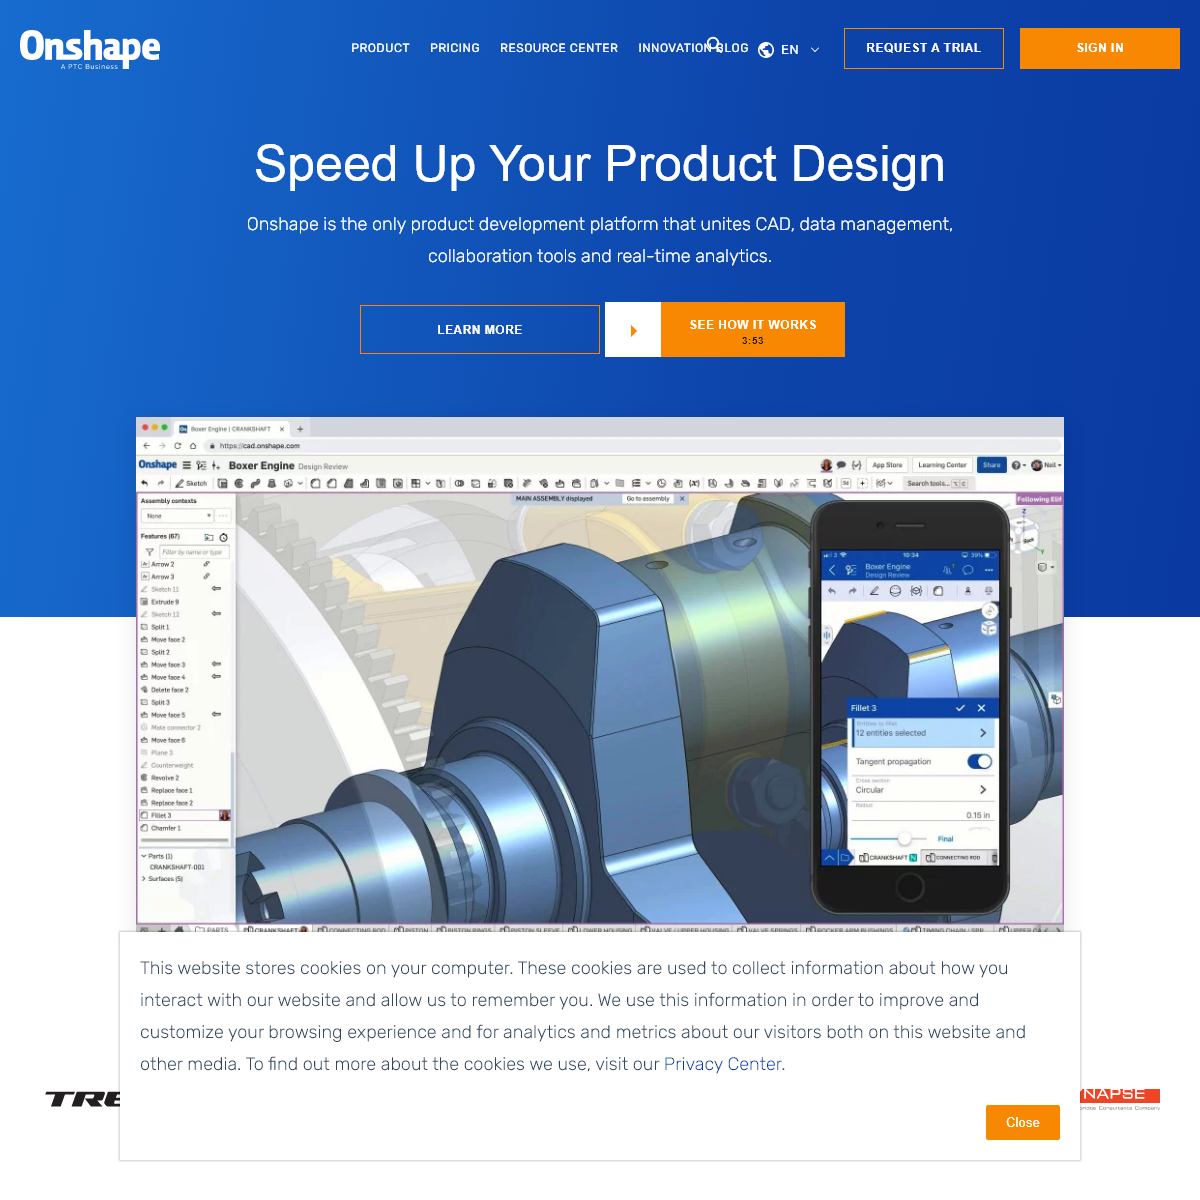 Onshape - Product Development Platform